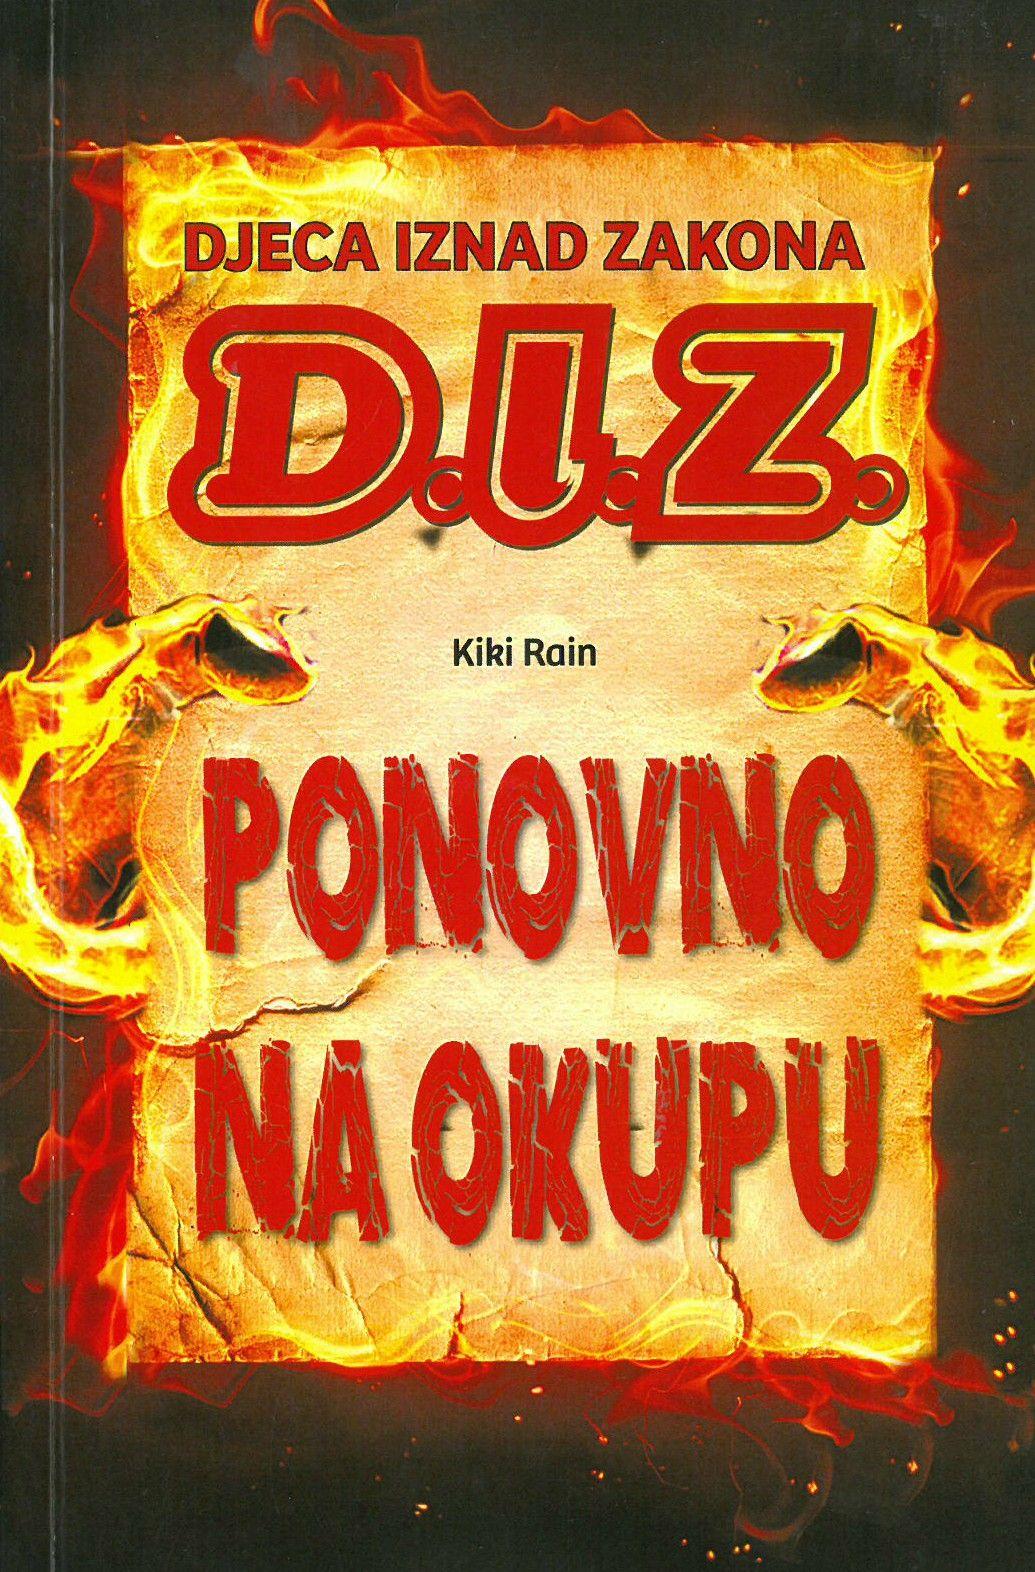 D.I.Z. - Djeca iznad zakona : ponovno na okupu / Kiki Rain. - Virovitica : Vedran Stanić, 2016. -